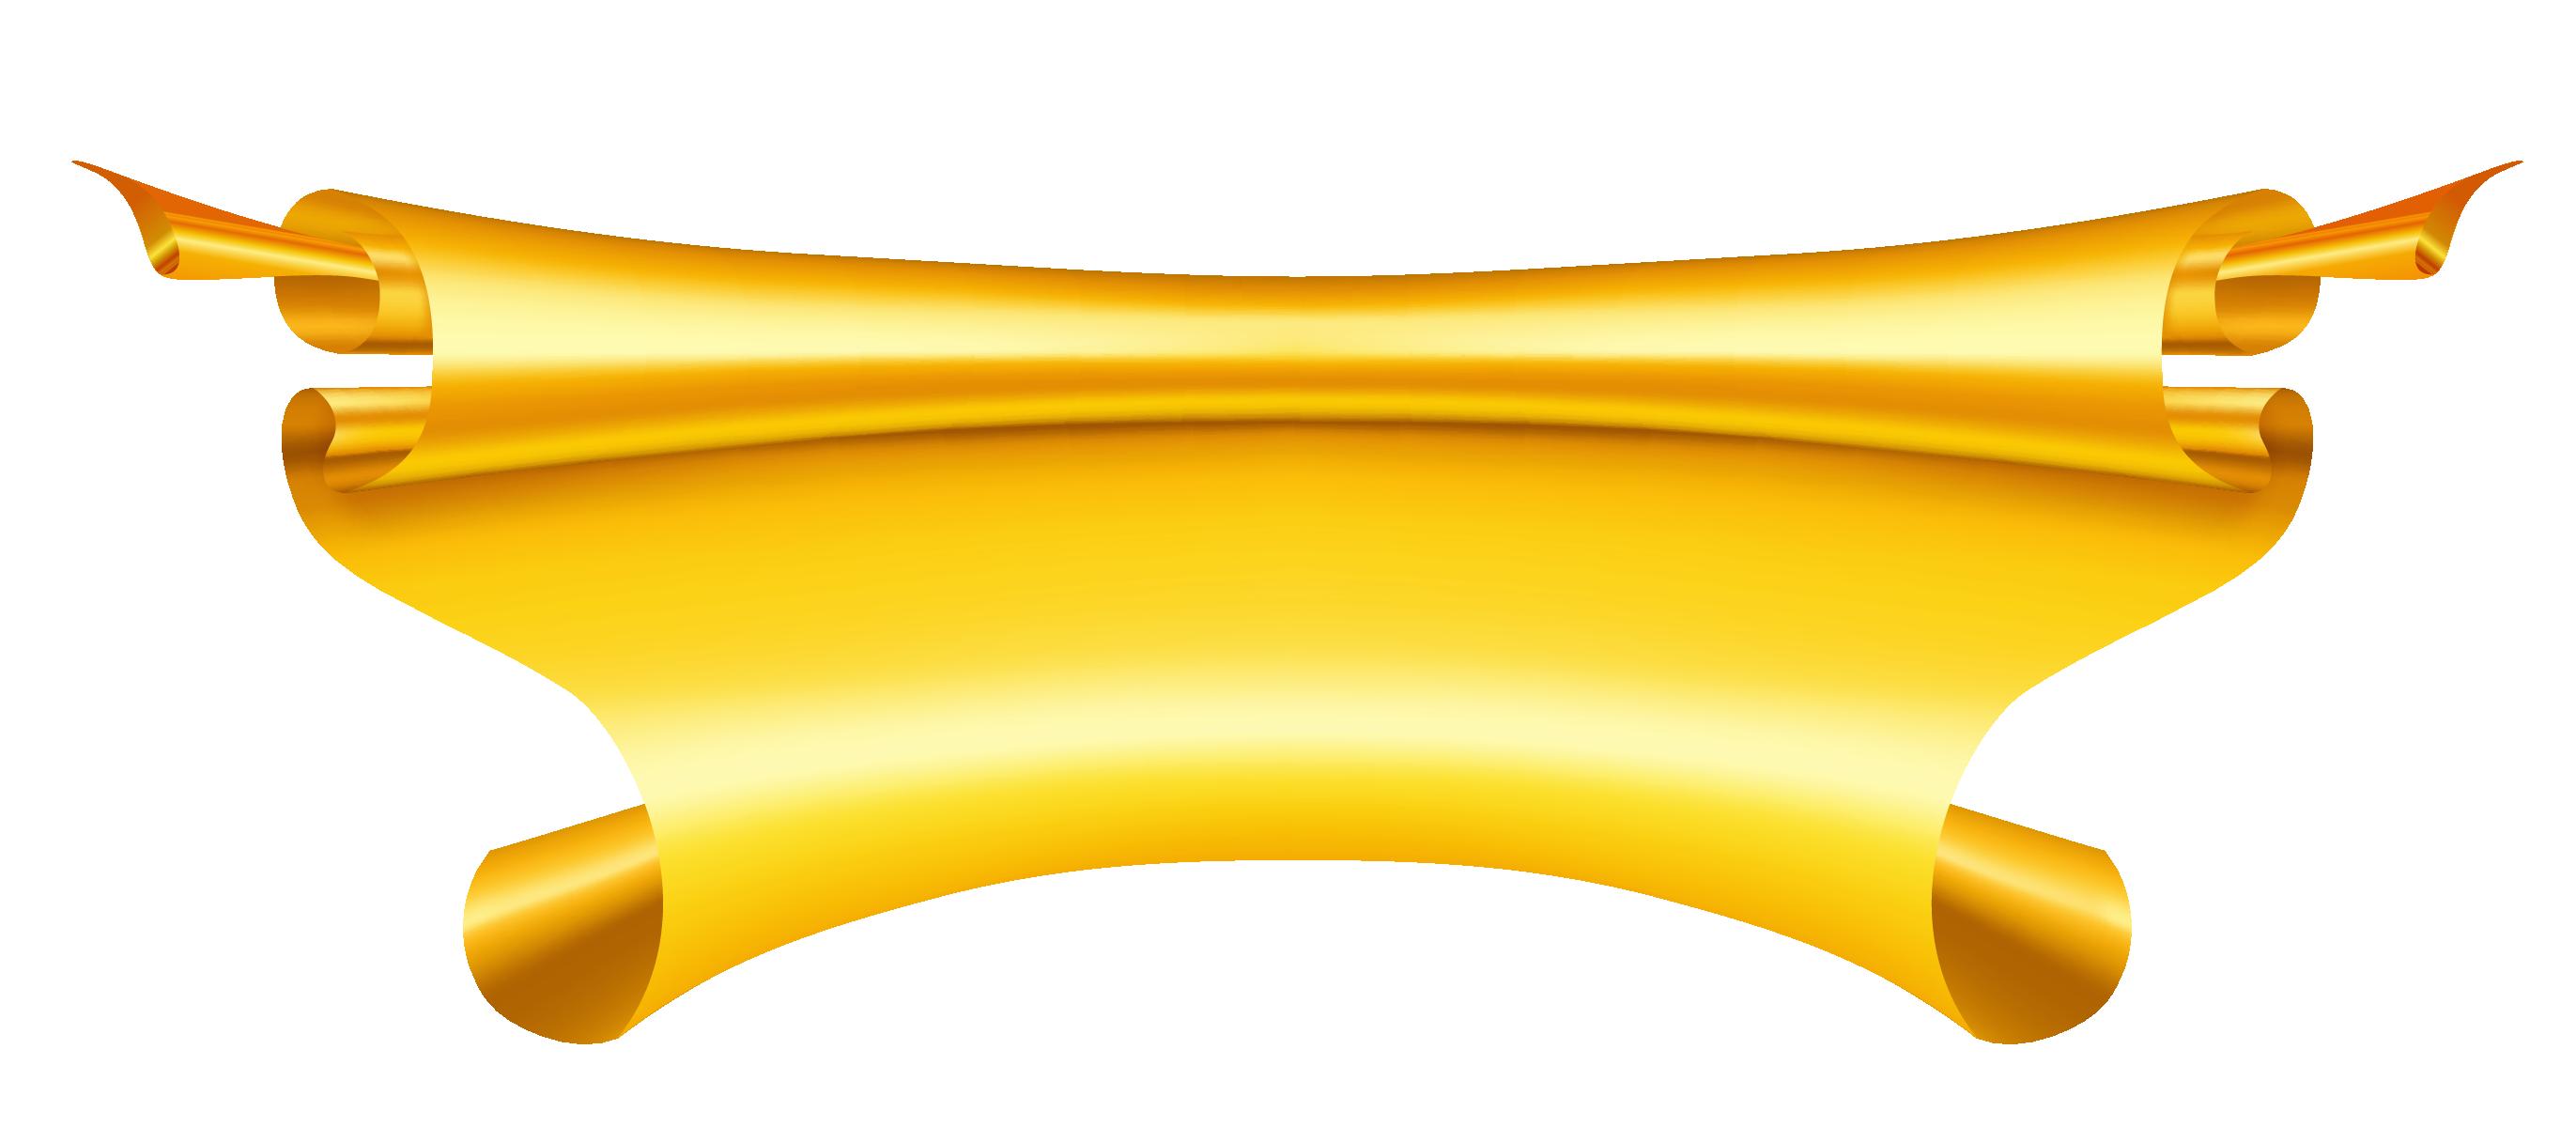 2743x1216 Gold Banner Clipartu200b Gallery Yopriceville